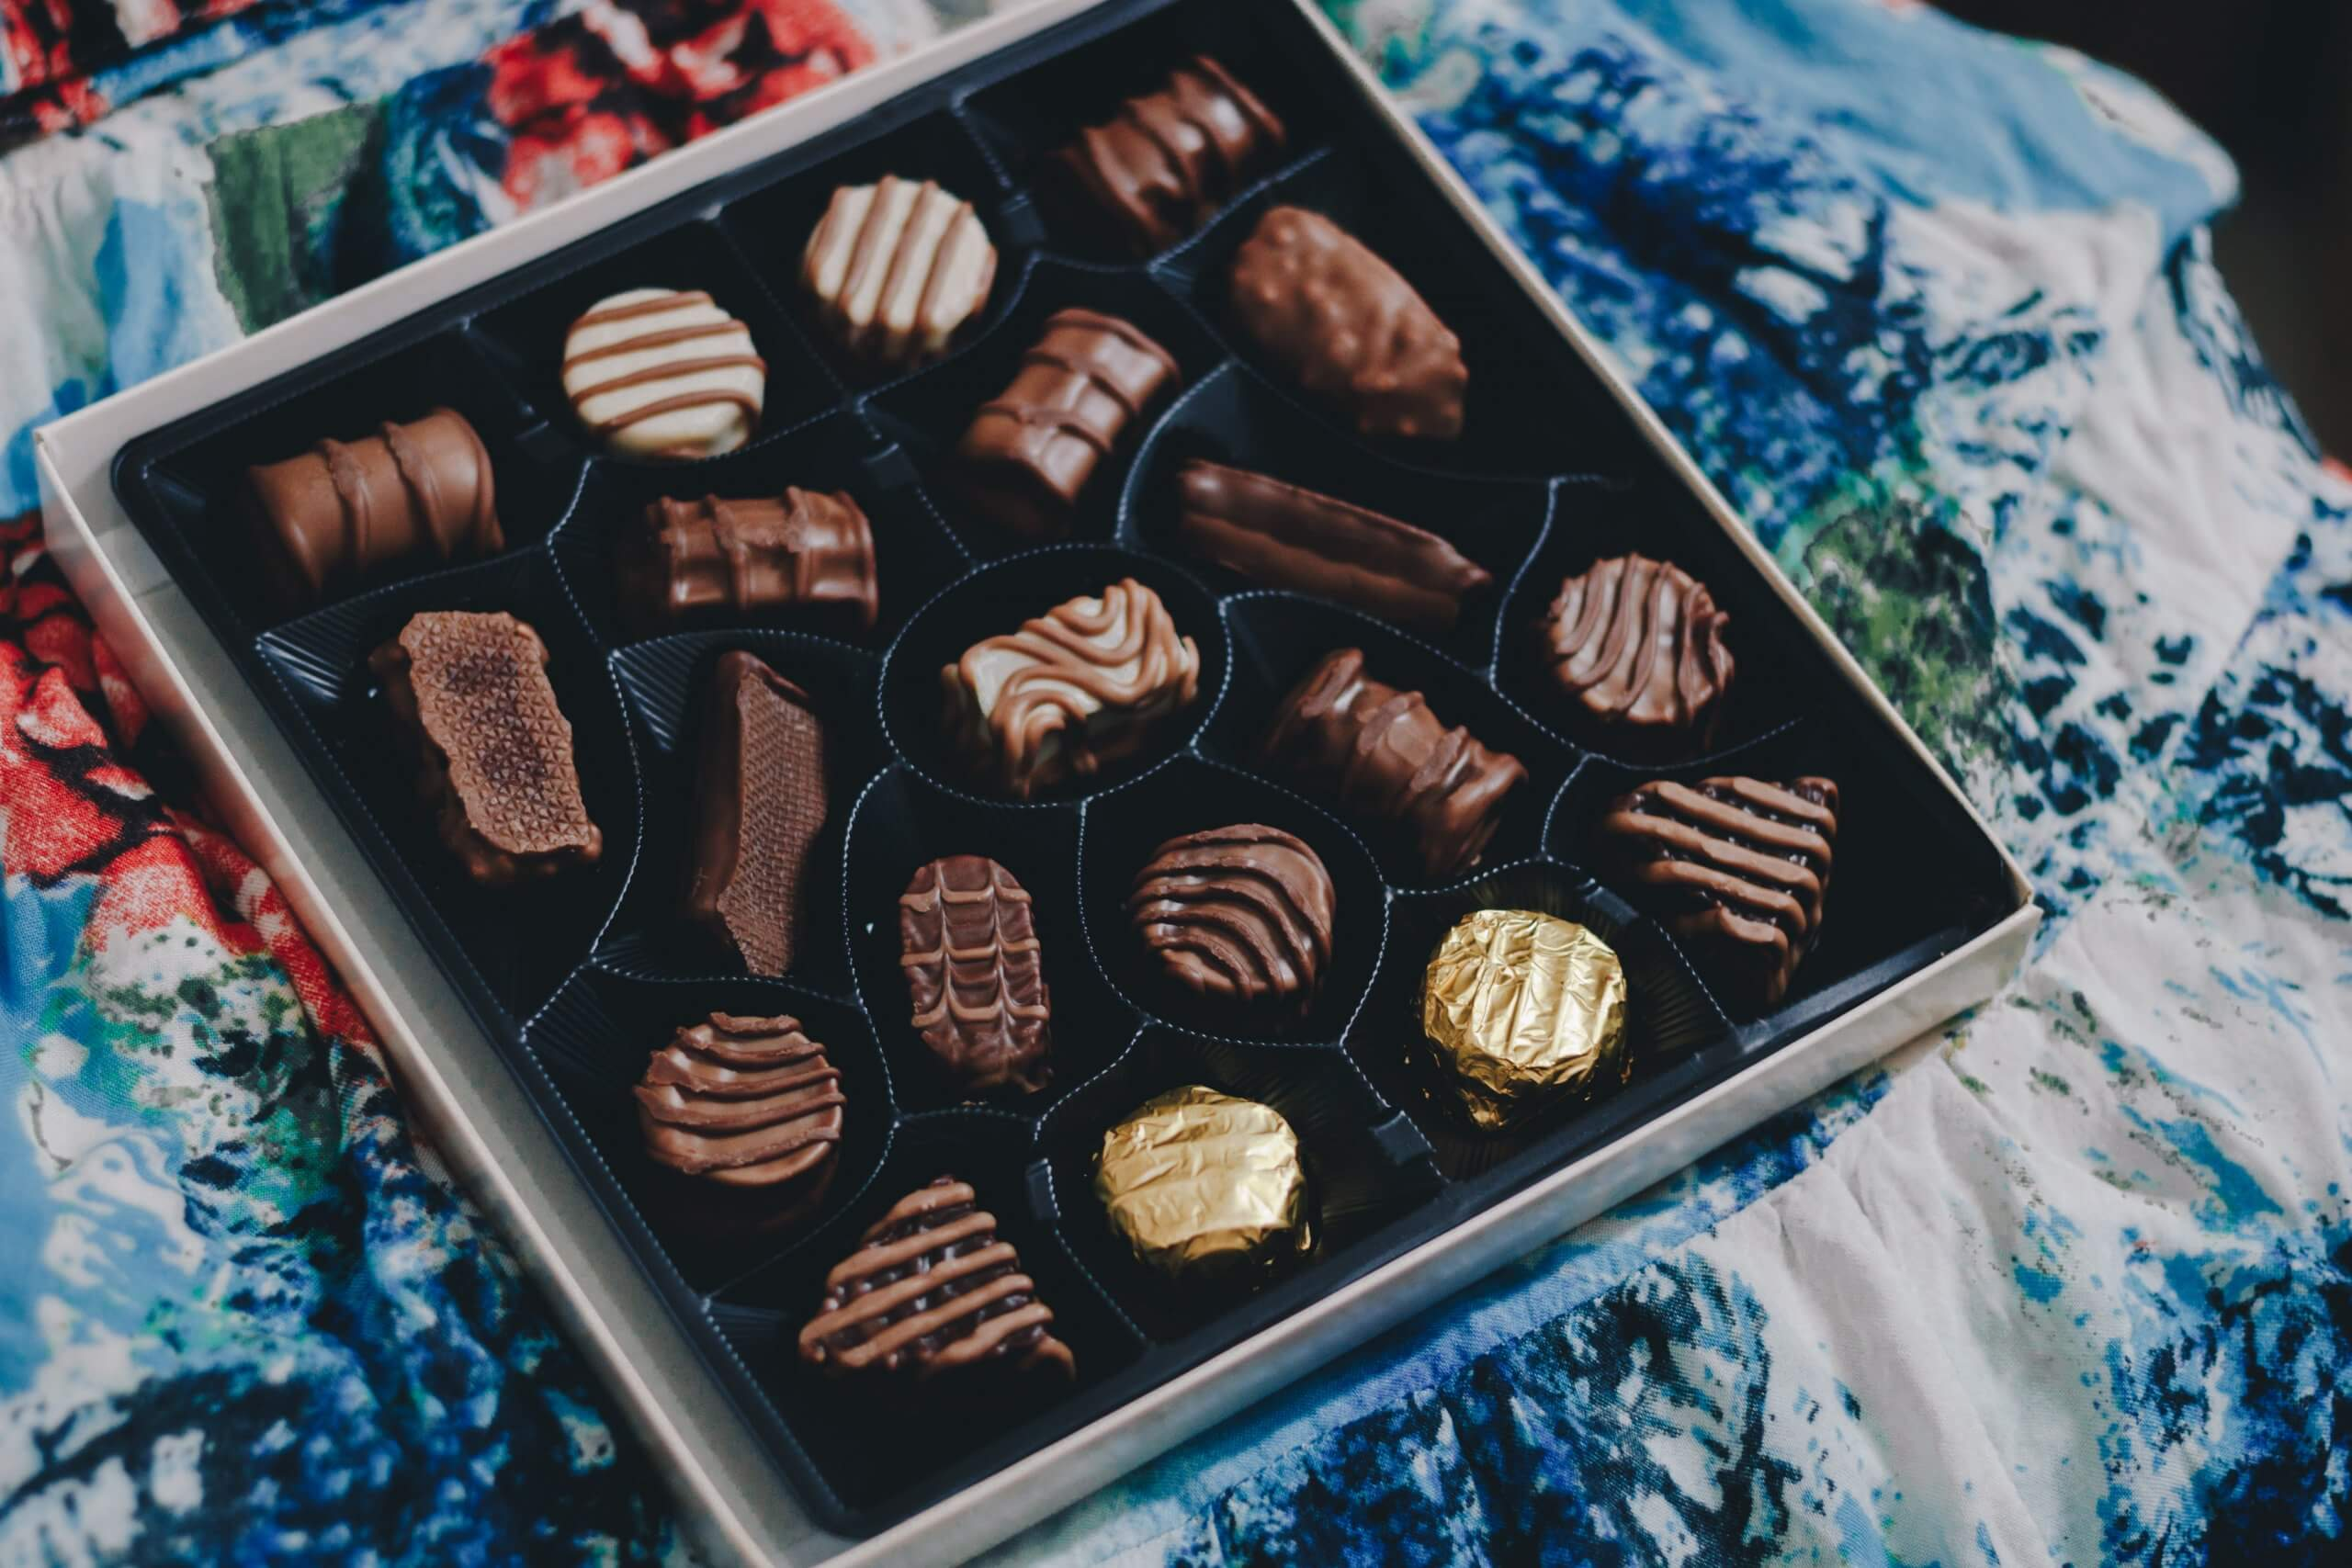 chocolate box with plastic tray